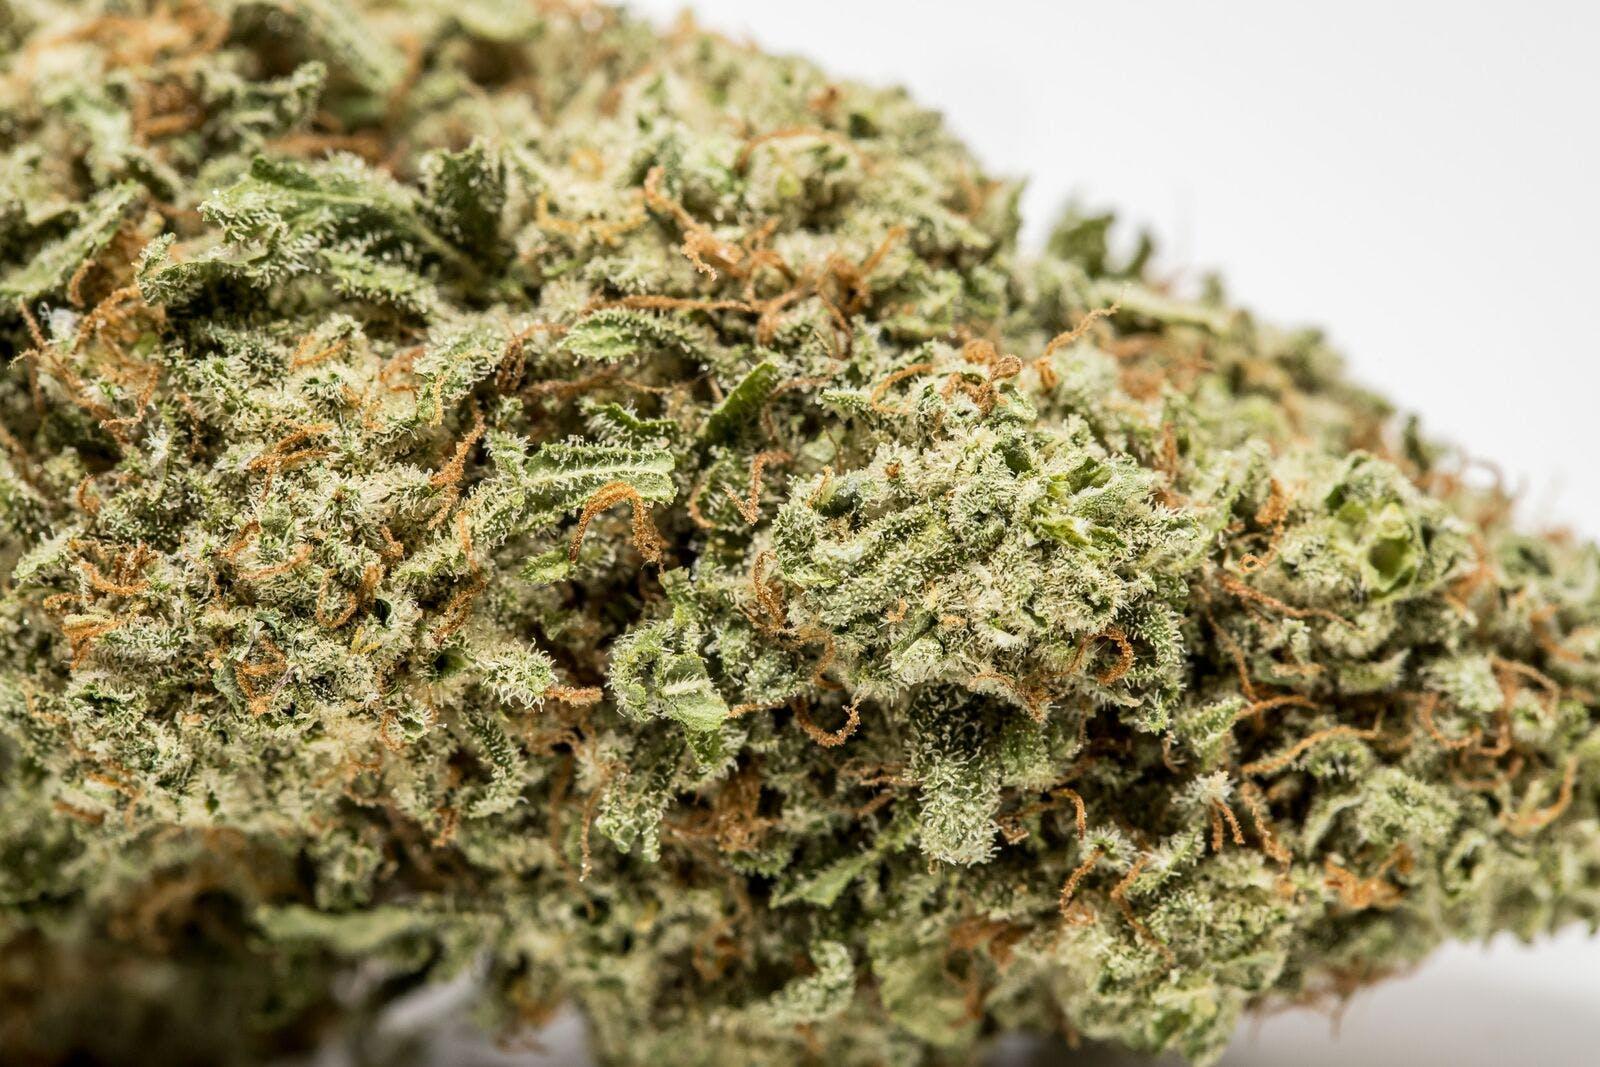 Pineapple Thai Weed; Pineapple Thai Cannabis Strain; Pineapple Thai Sativa Marijuana Strain